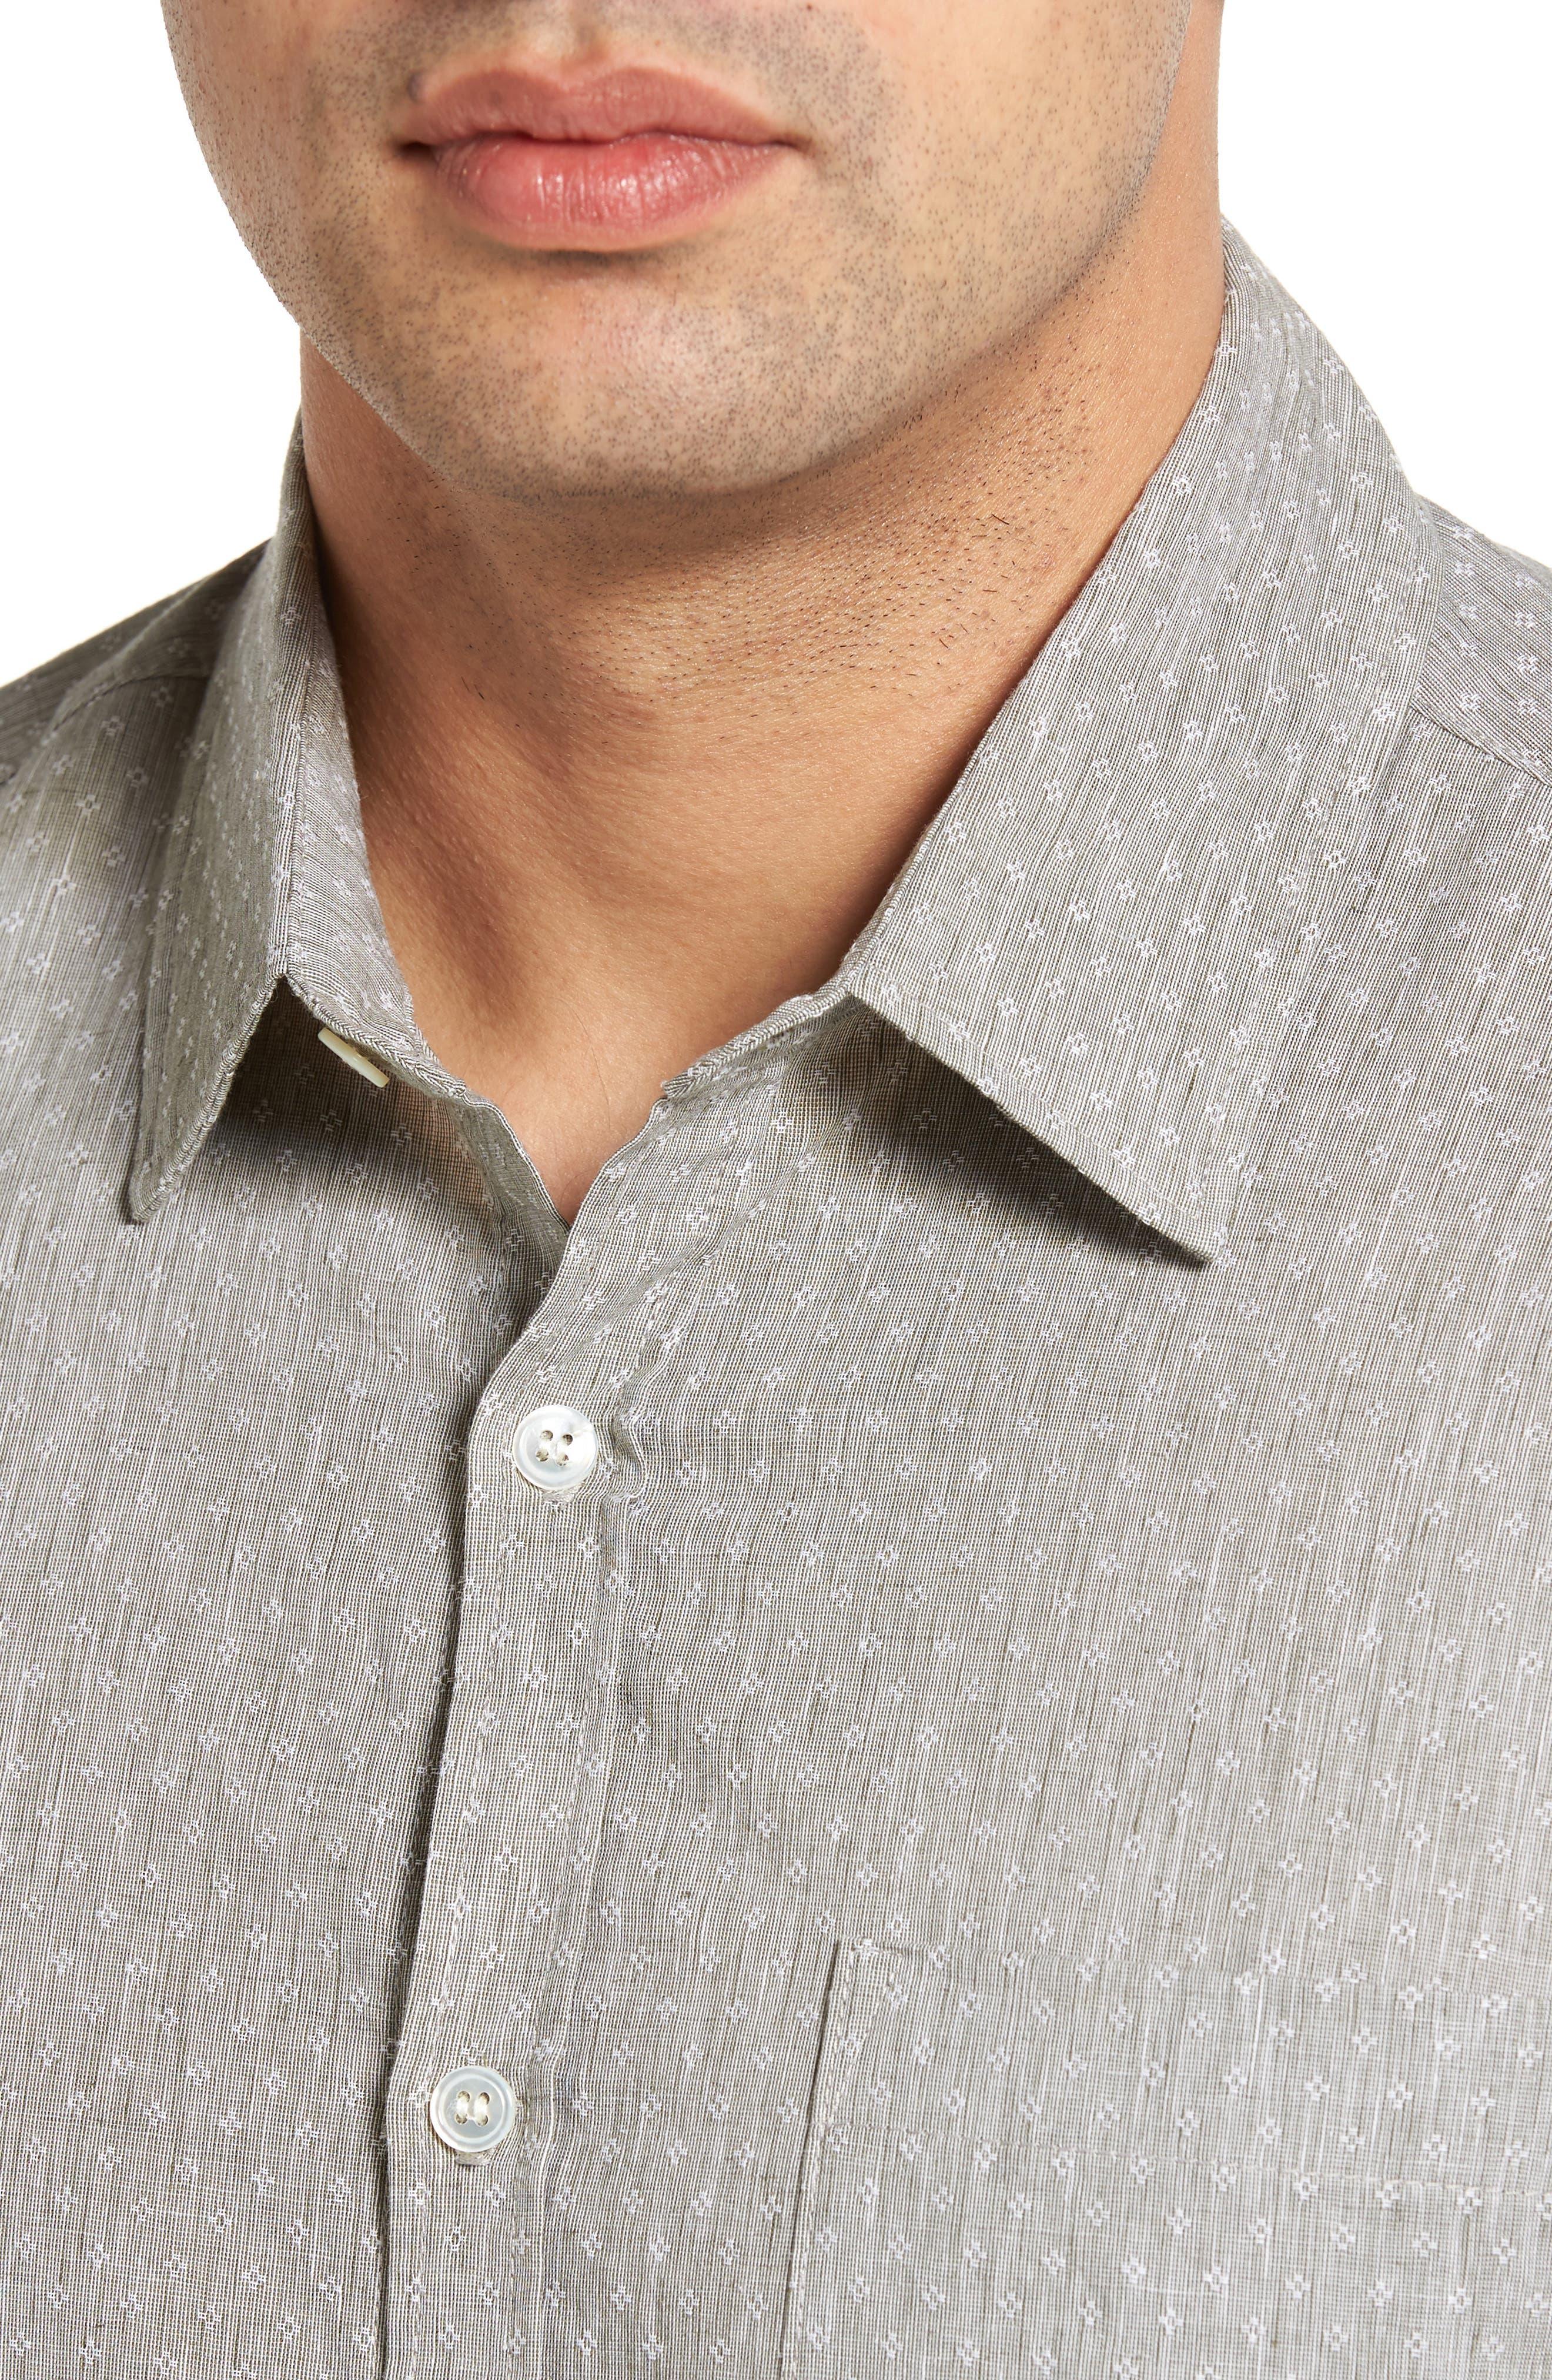 Classic Fit Sport Shirt,                             Alternate thumbnail 4, color,                             310